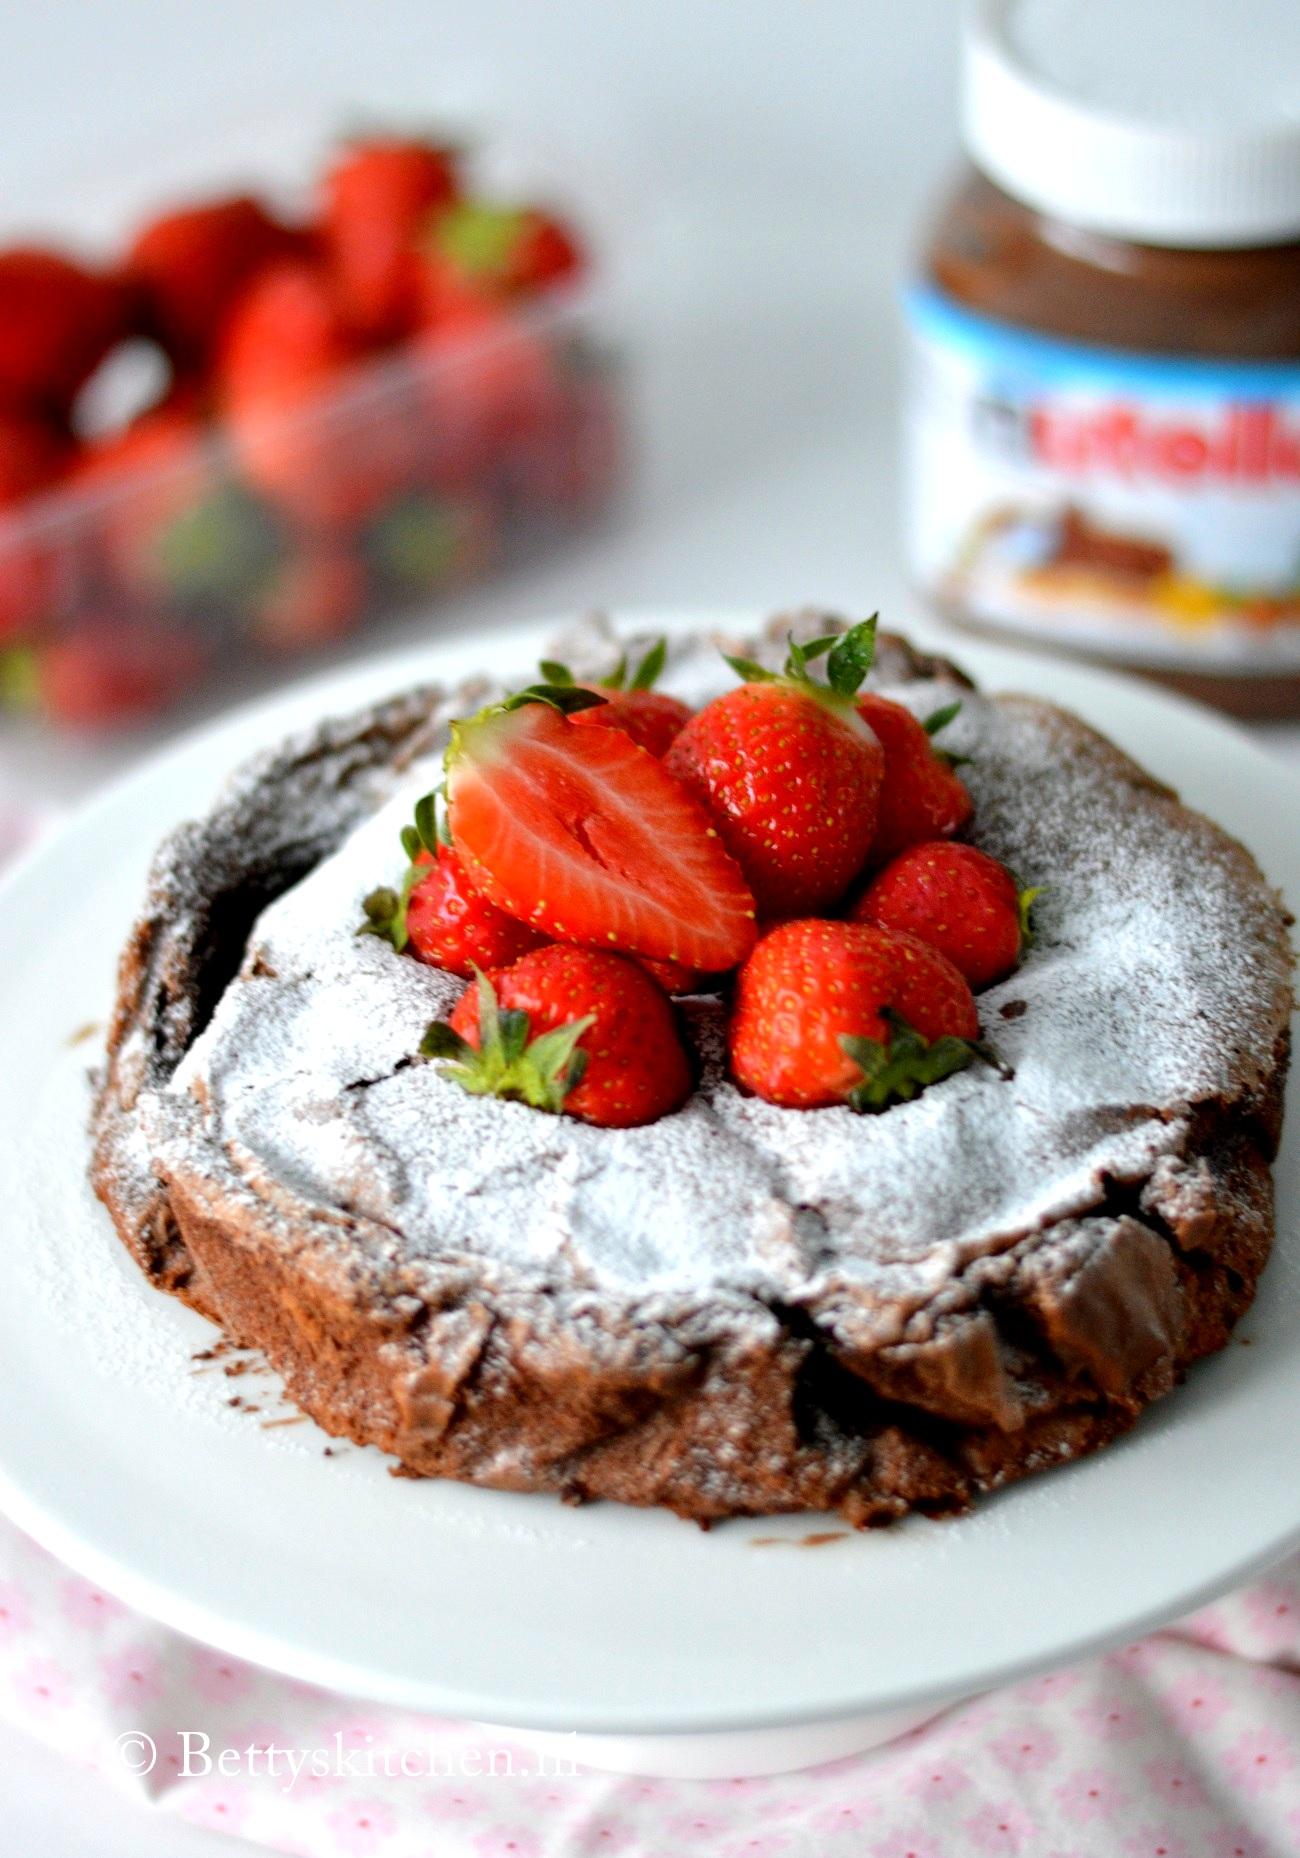 Filmpje: Nutella Brownie Taart met slechts 3 ingredienten ...